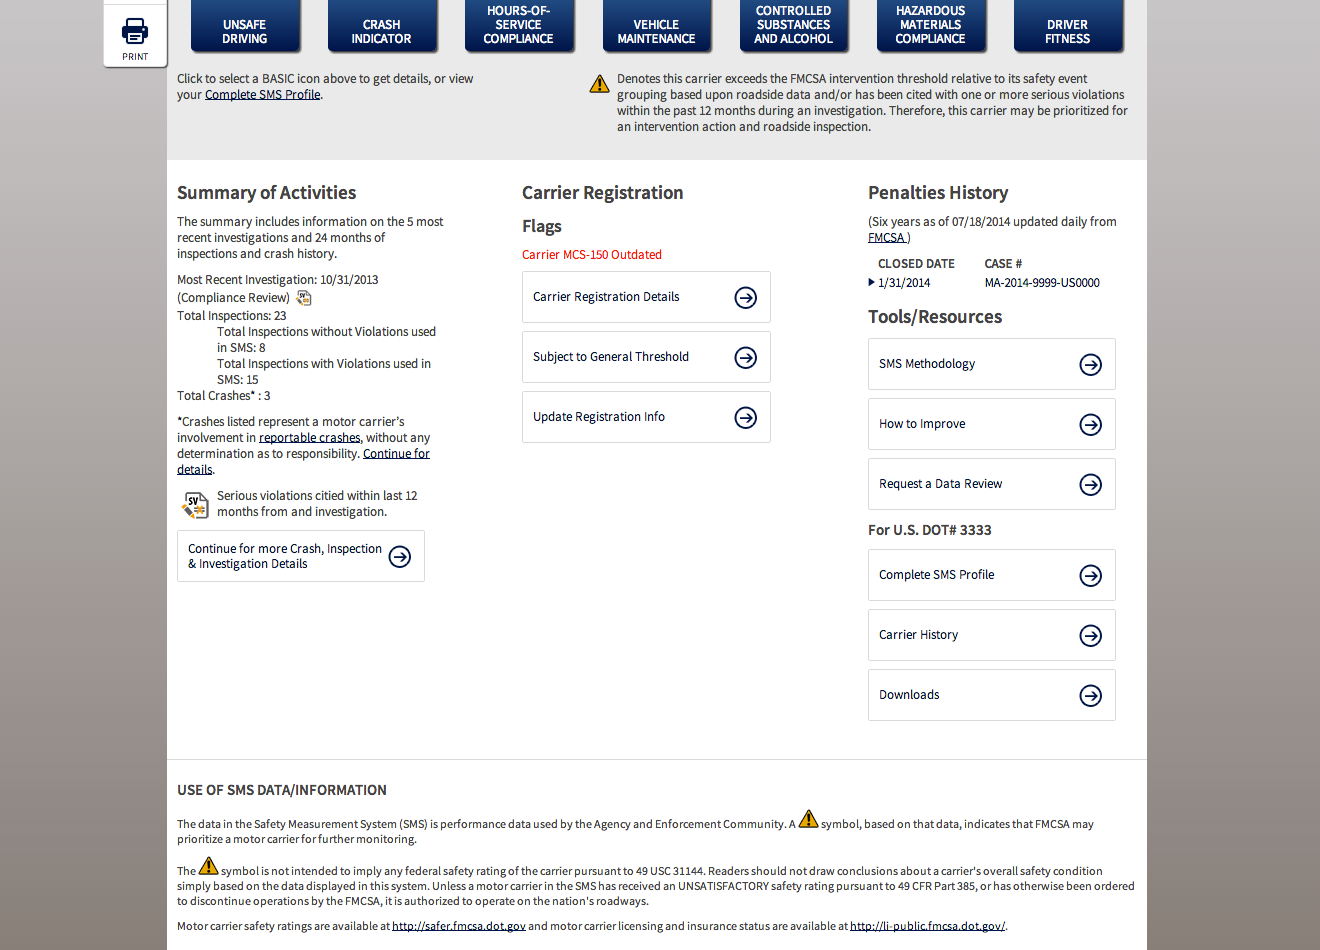 Fmcsa biennial update form for Motor carrier identification report mcs 150